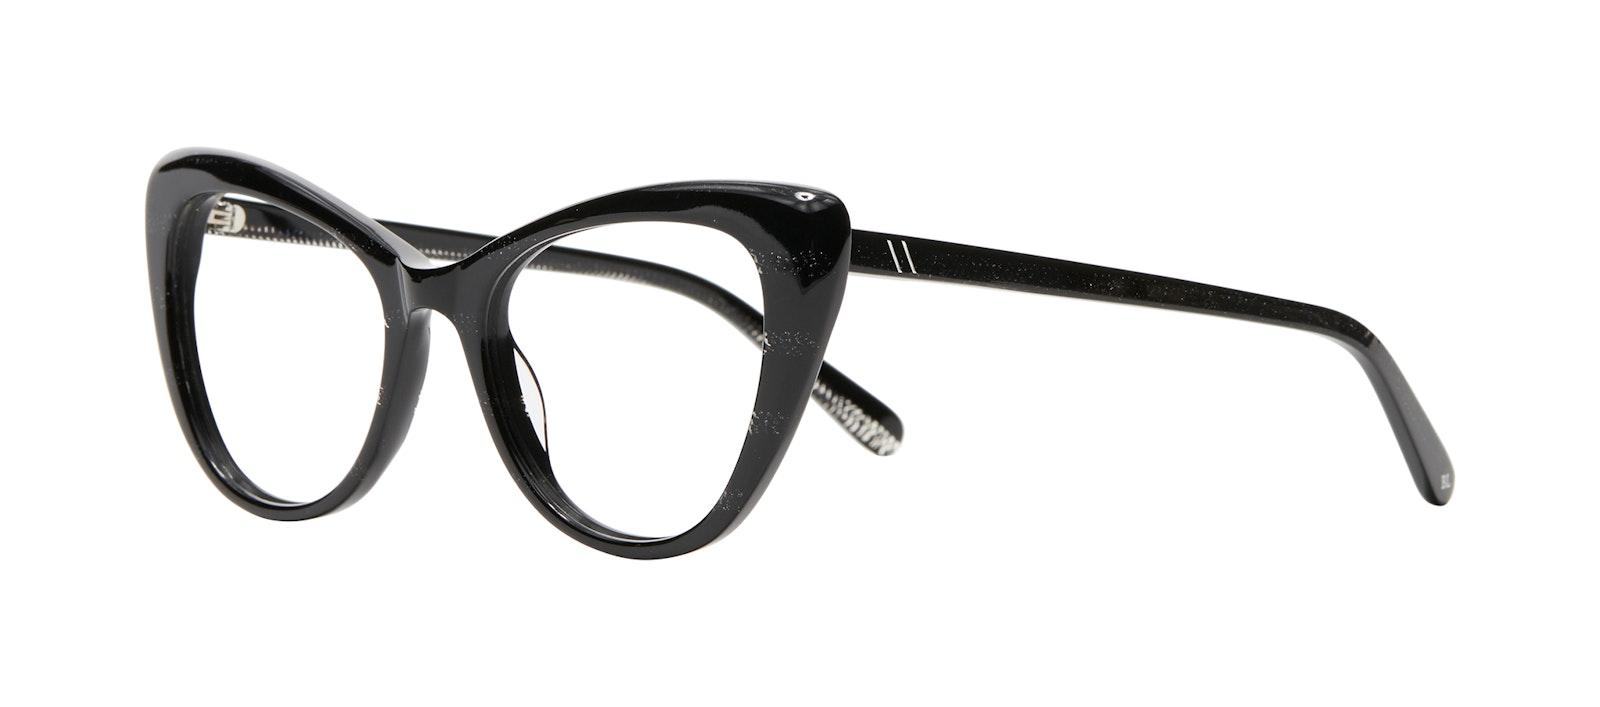 Affordable Fashion Glasses Cat Eye Eyeglasses Women Verve Night Tilt